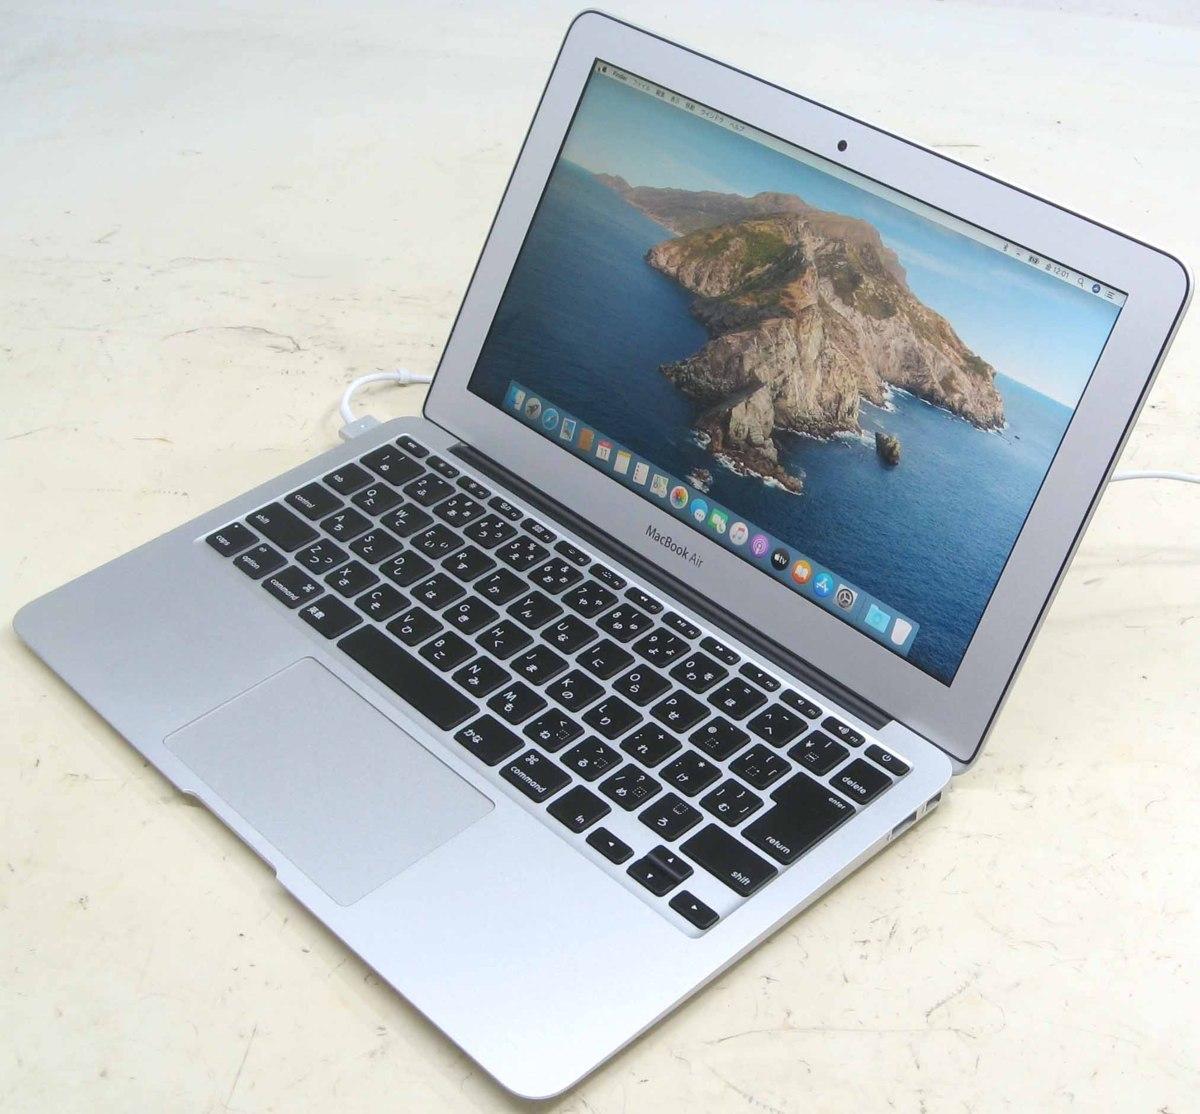 Apple MacBook Air MJVP2J/A Corei5 1.6GHz 4GB SSD256GB 11.6インチ Mac OS 10.15 無線 Bluetooth Webカメラ アップル マック マッキントッシュ 中古パソコン 中古MAC